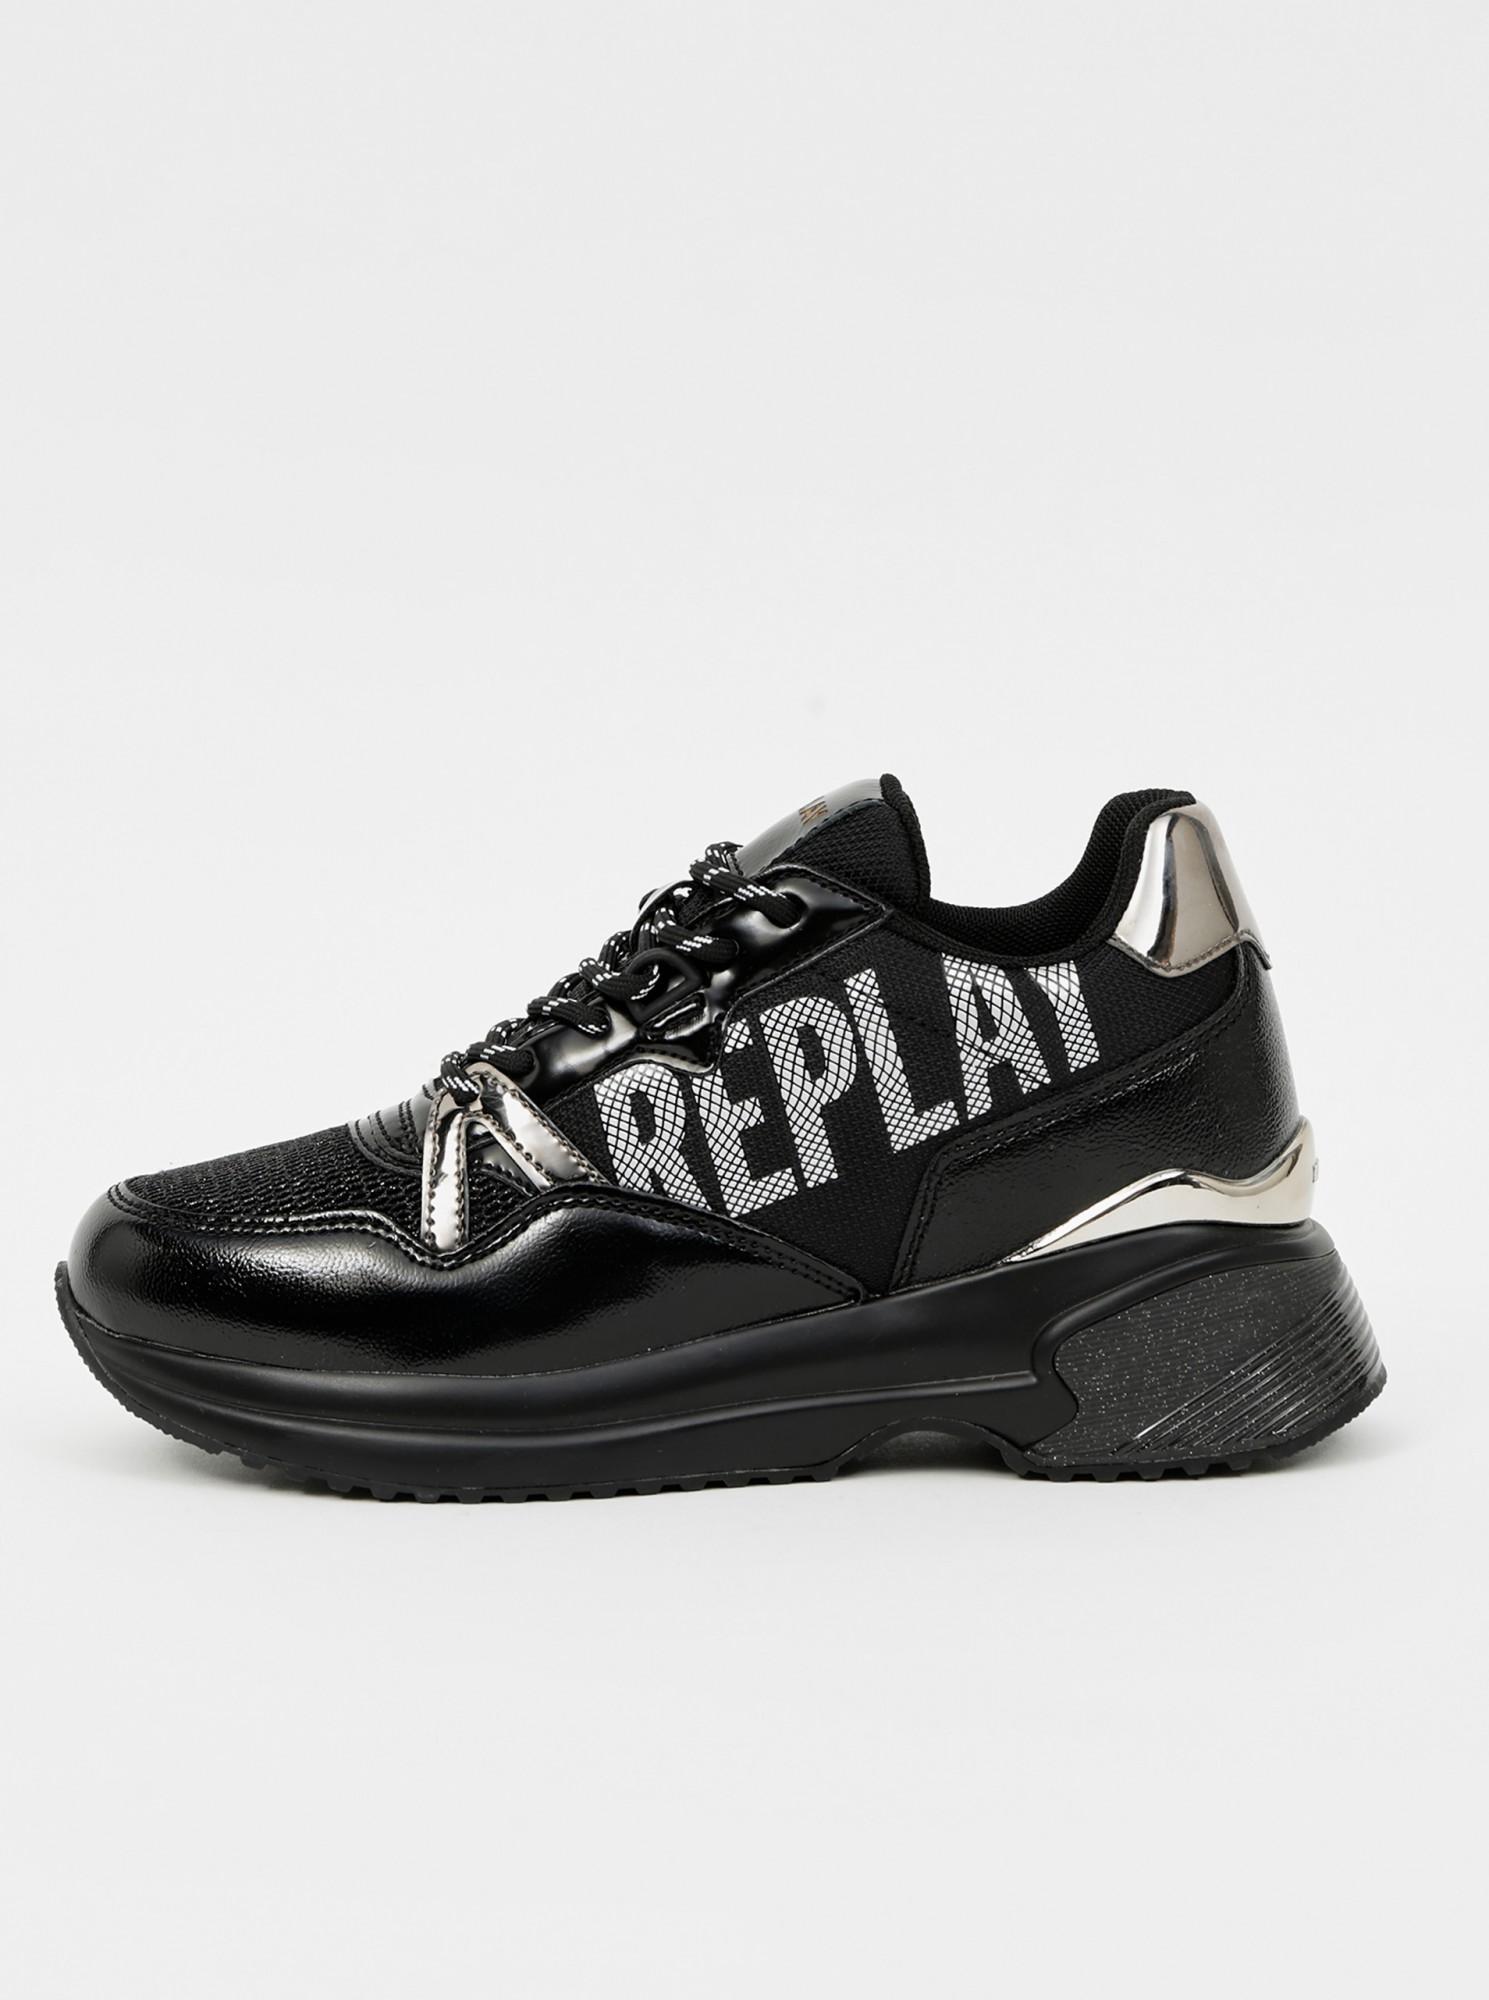 Replay čierne tenisky - 37